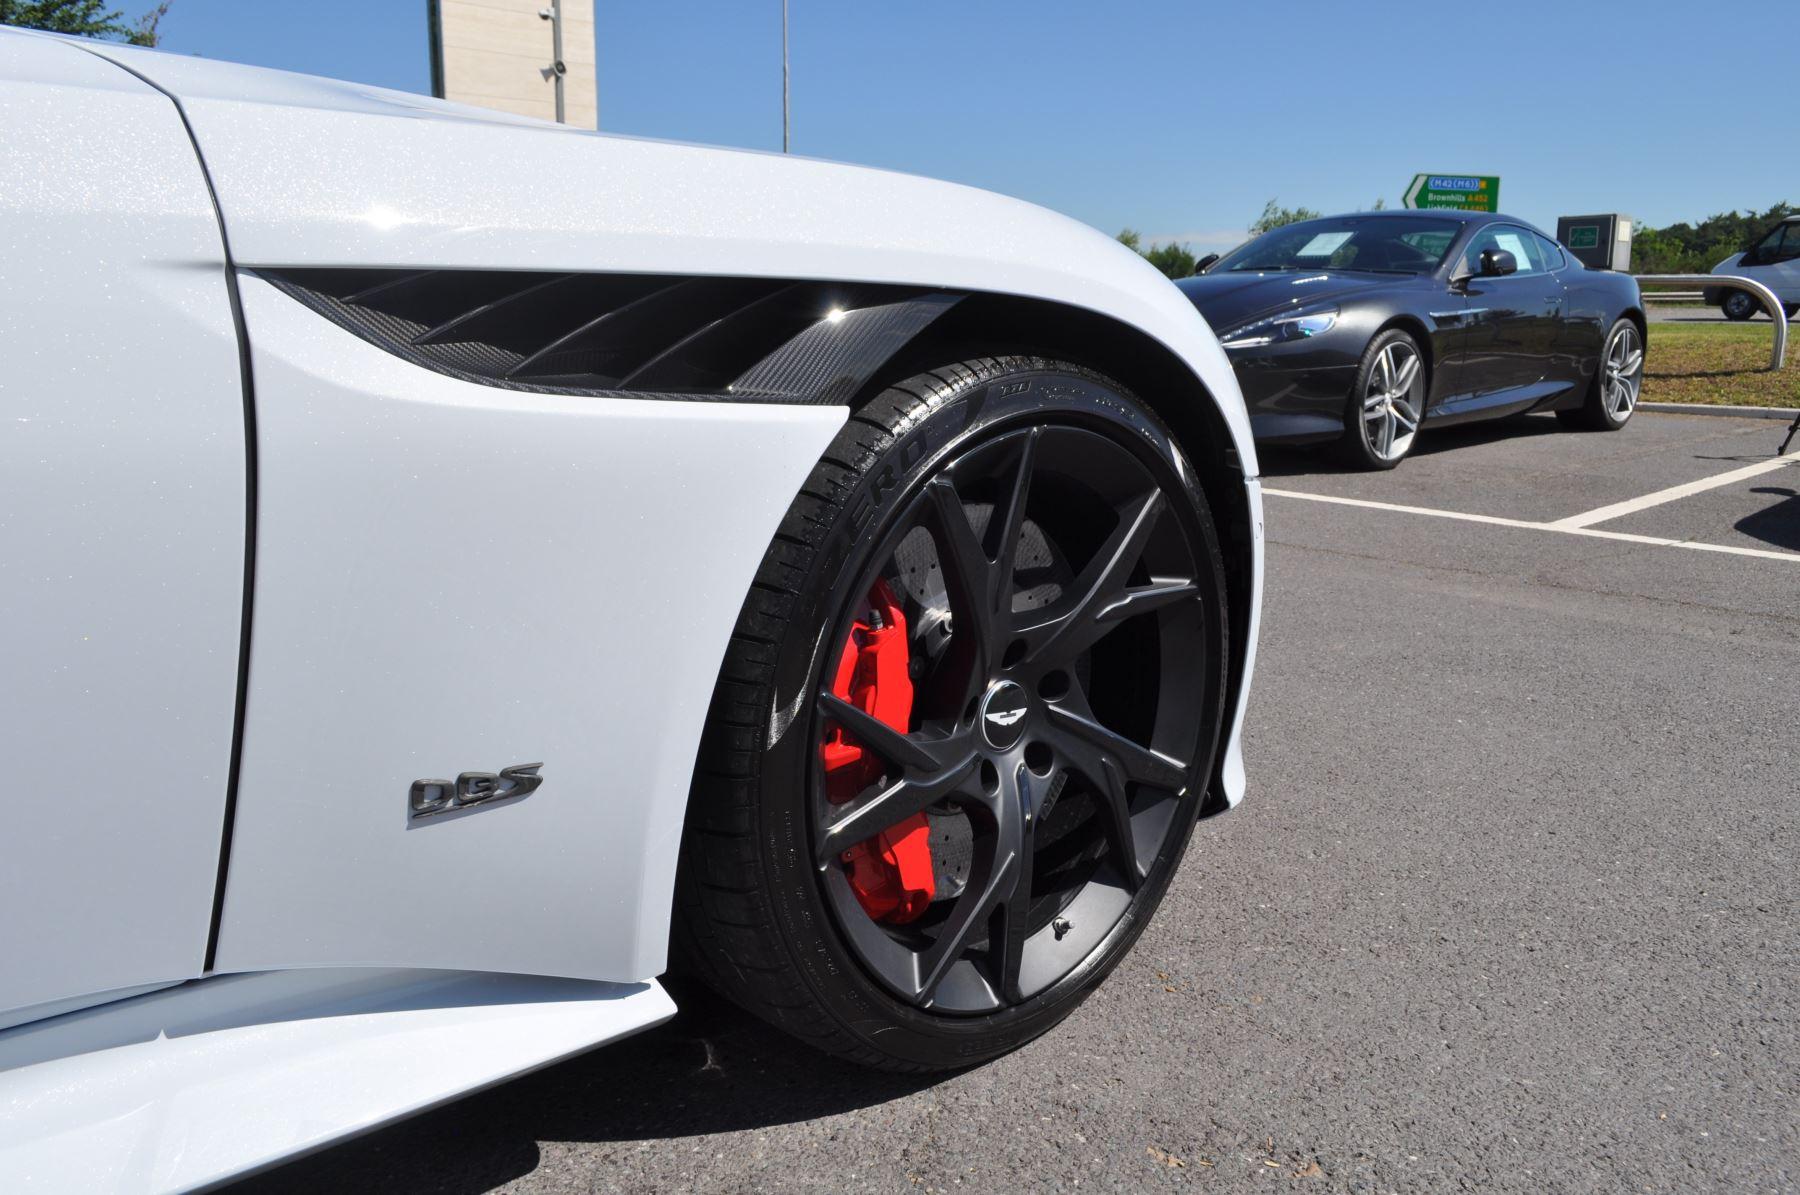 Aston Martin DBS V12 Superleggera 2dr Touchtronic image 41